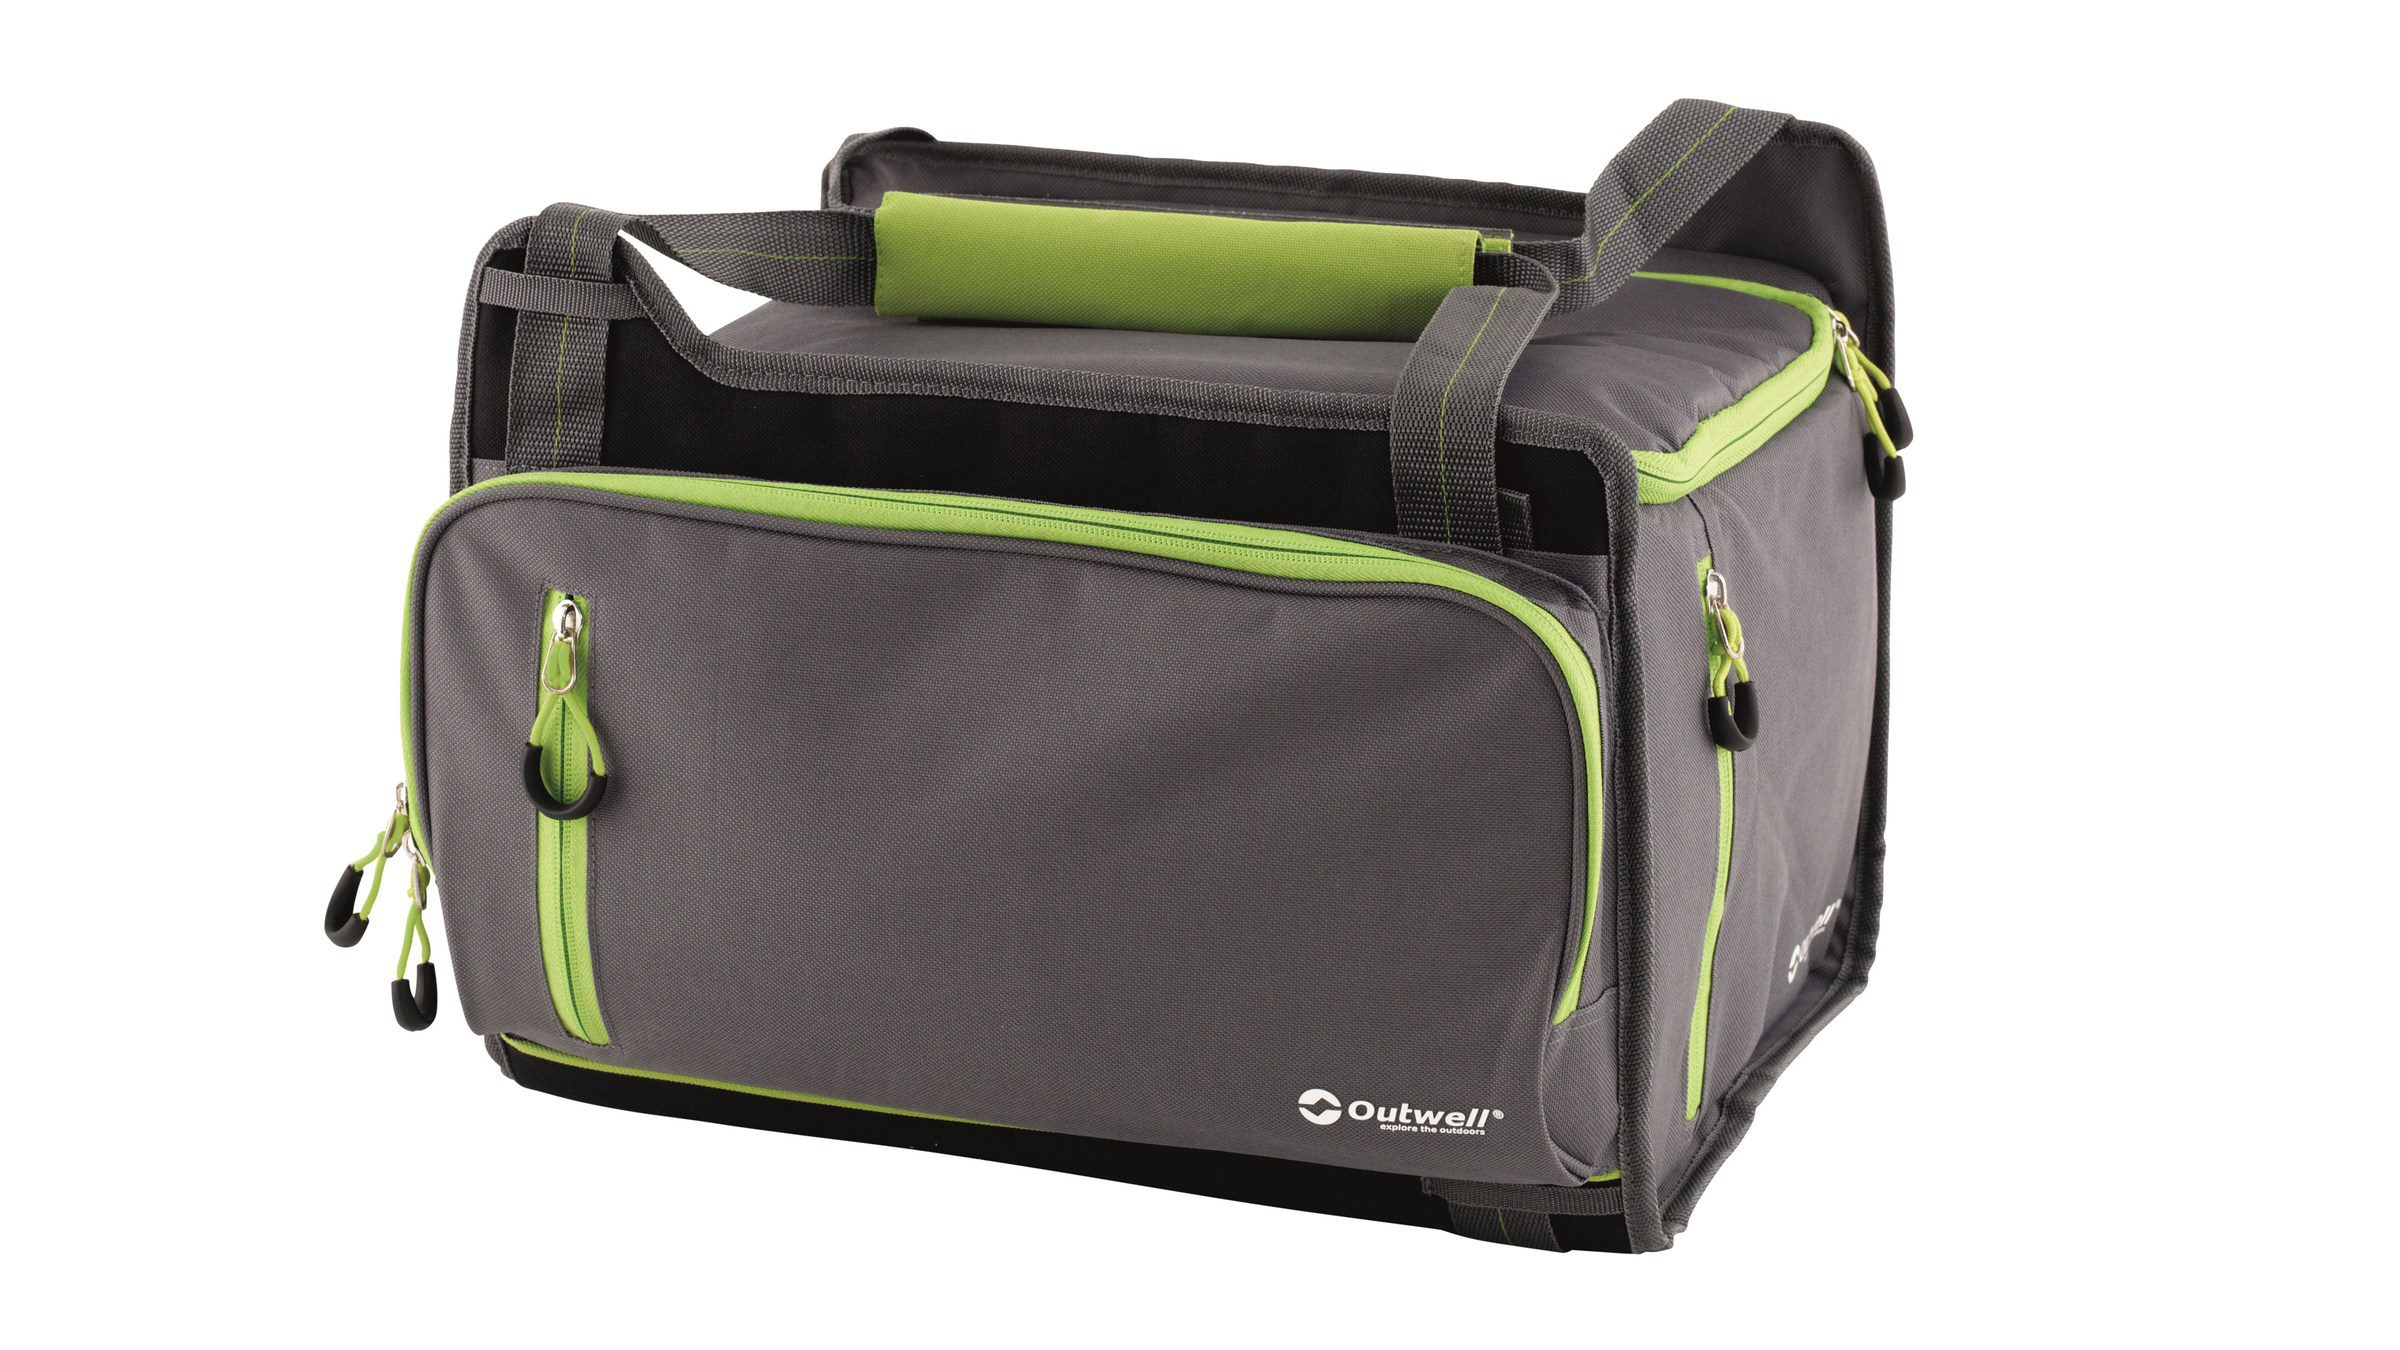 Outwell Cormorant M Cool bag